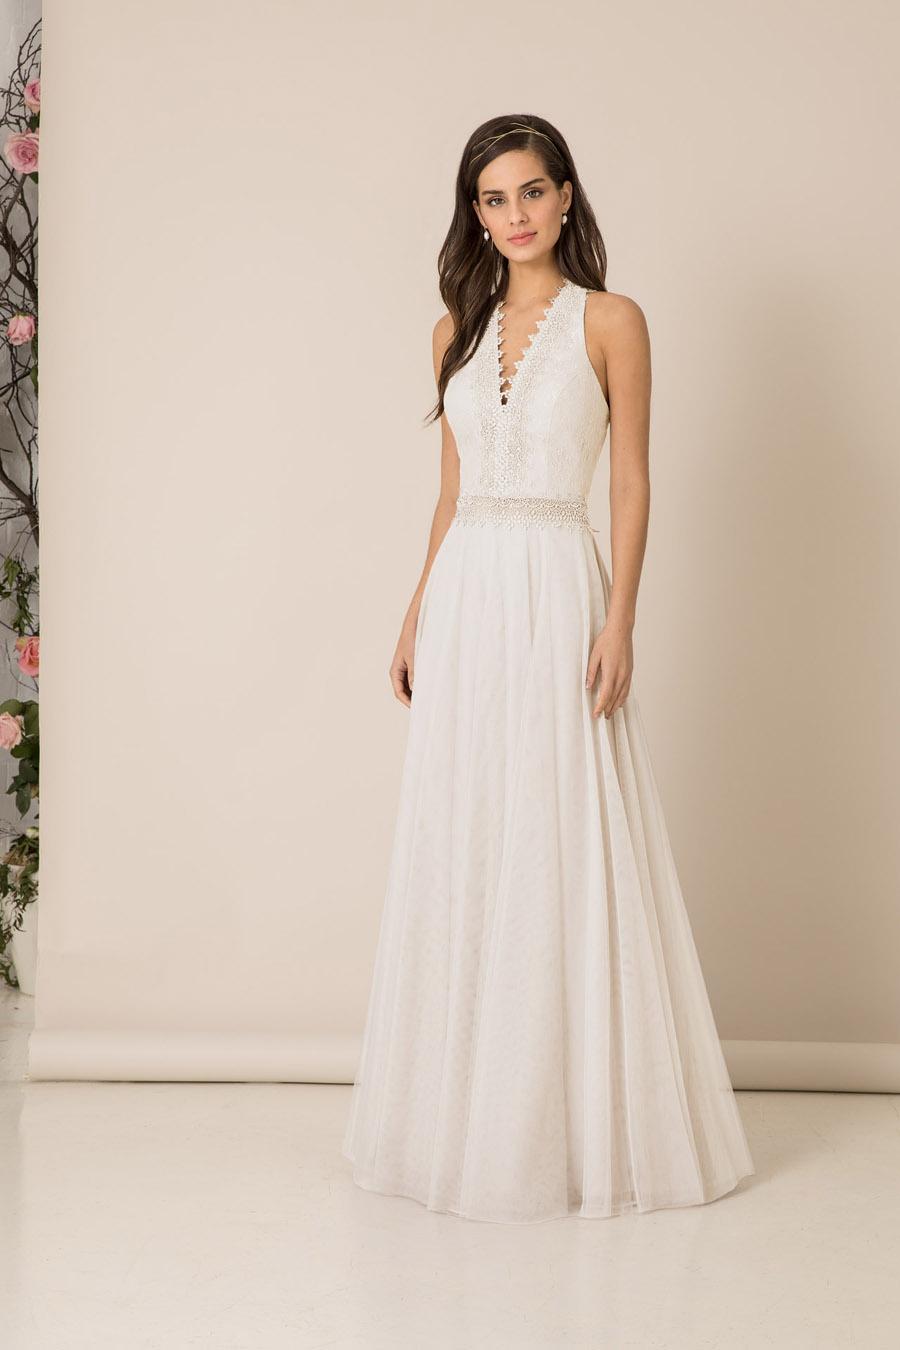 The English Wedding Blog showcases Kelsey Rose 2019 bridal collection (11)